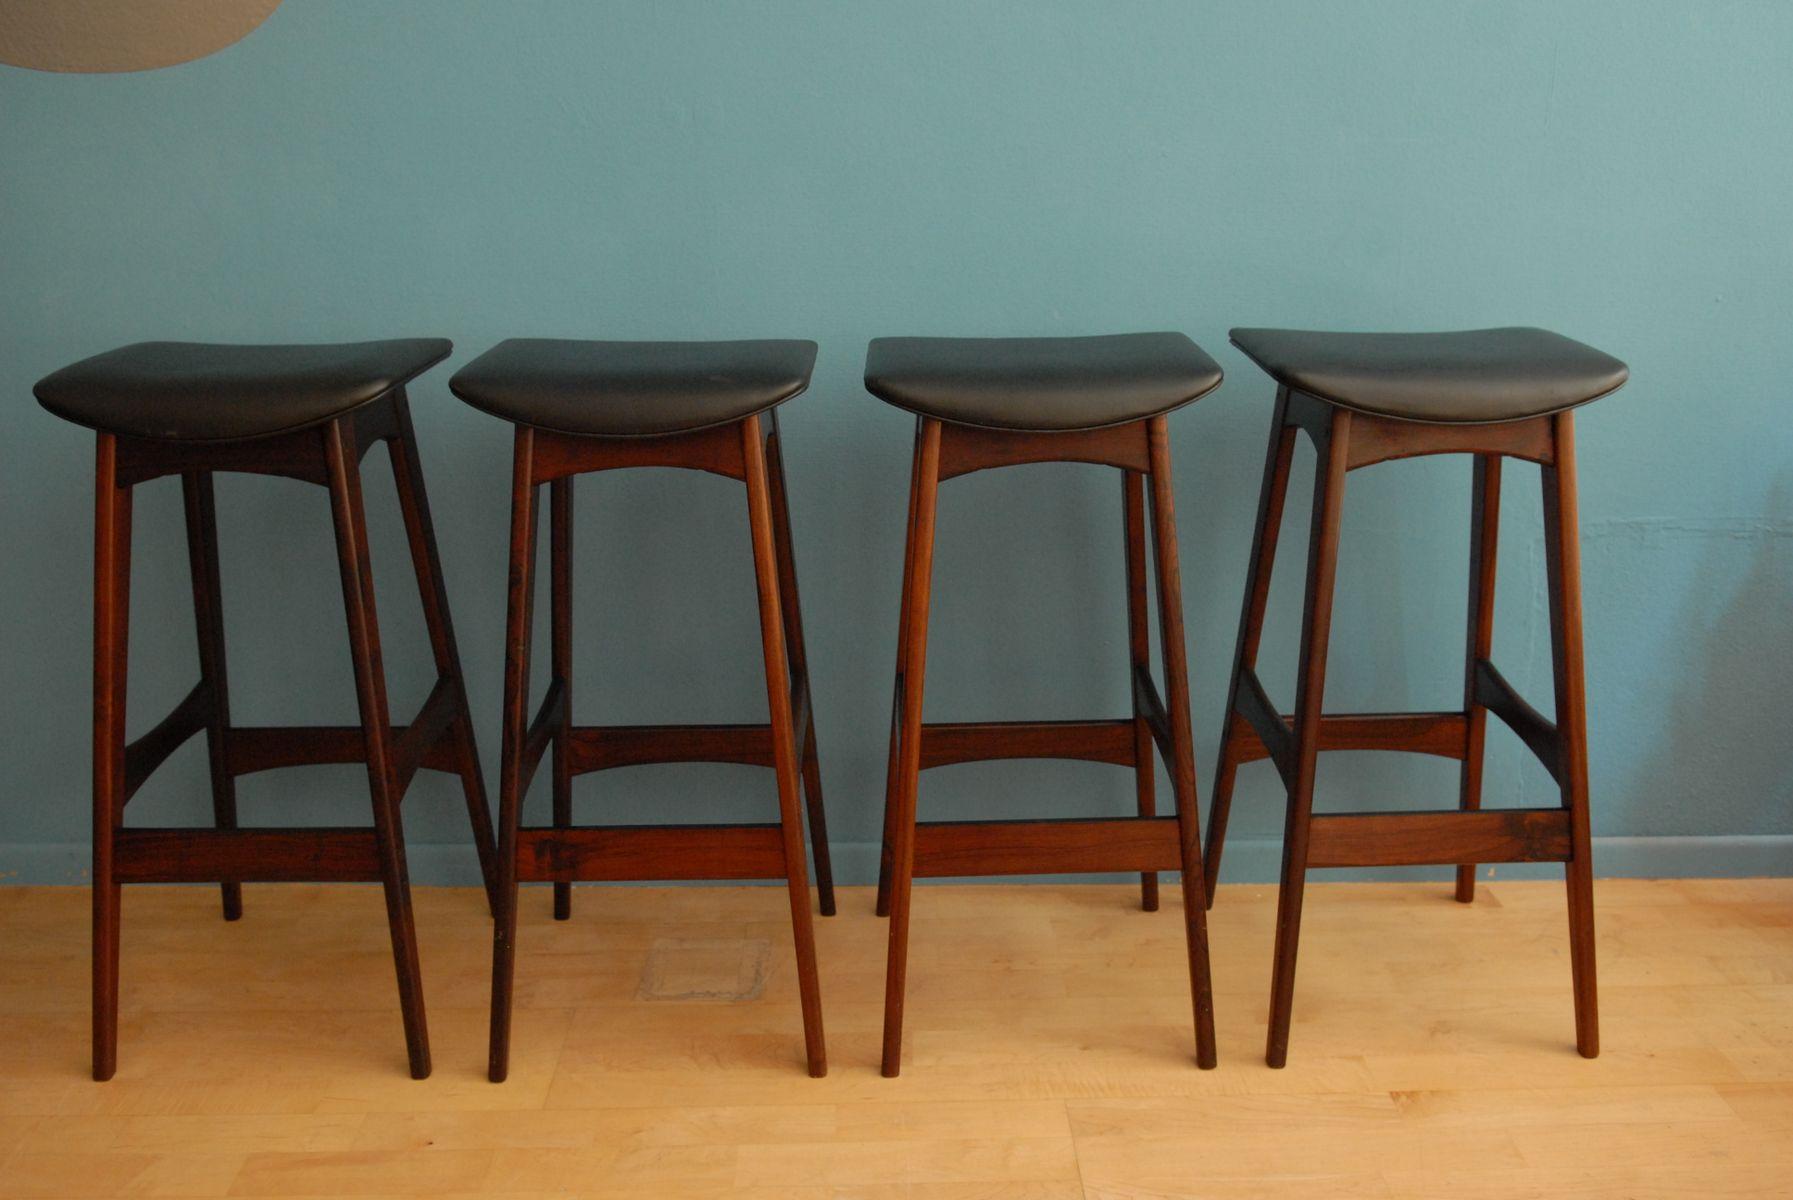 barhocker von johannes andersen f r br dere andersen. Black Bedroom Furniture Sets. Home Design Ideas